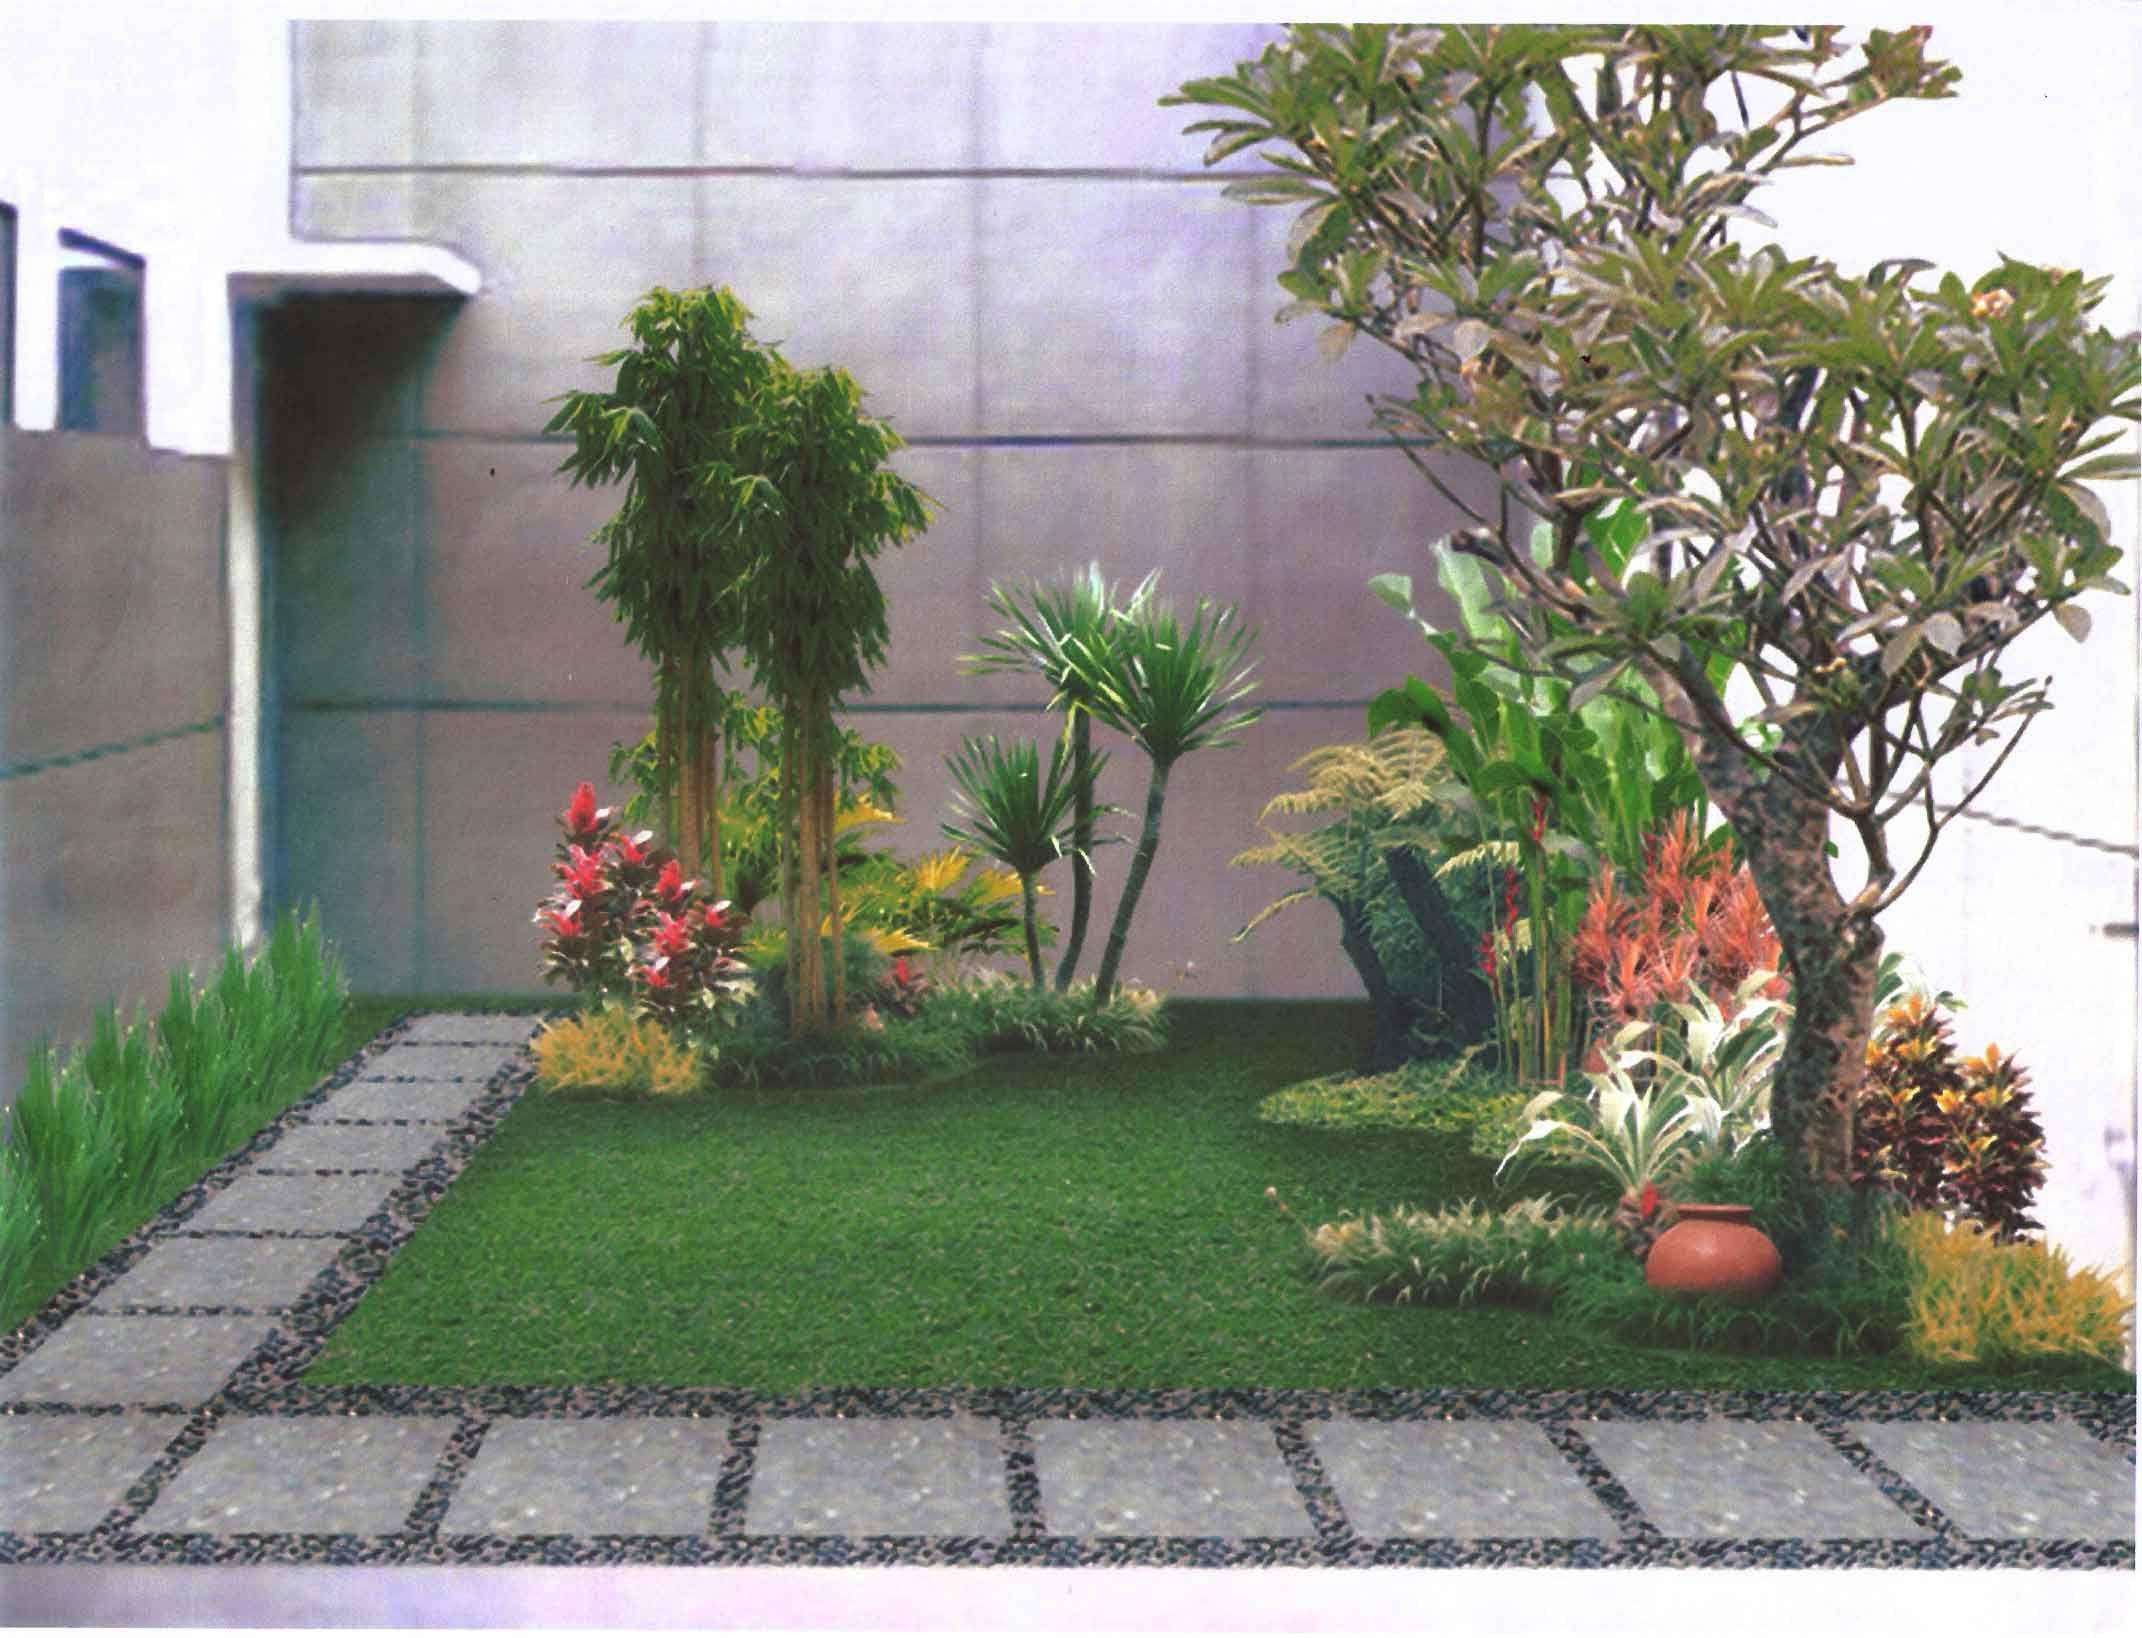 Taman Rumah Minimalis Gambar Rumah Minimalis dan juga peminat